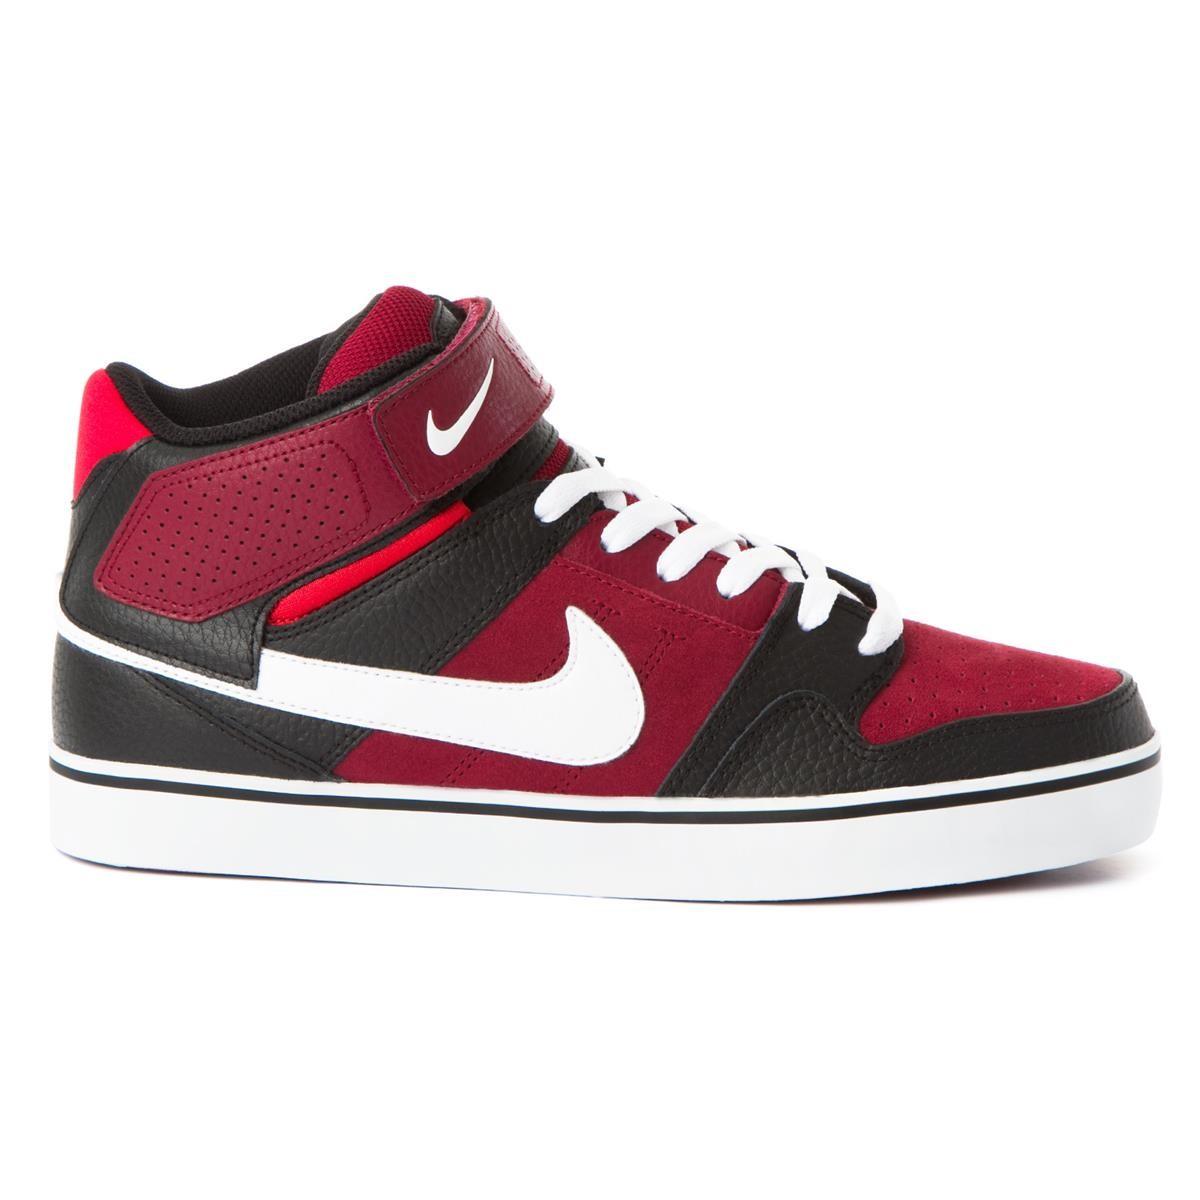 Nike Schuhe Mogan Mid 2 SE Team Red/White-Black   Maciag Offroad: www.maciag-offroad.de/nike-schuhe-mogan-mid-2-se-team-red-white...